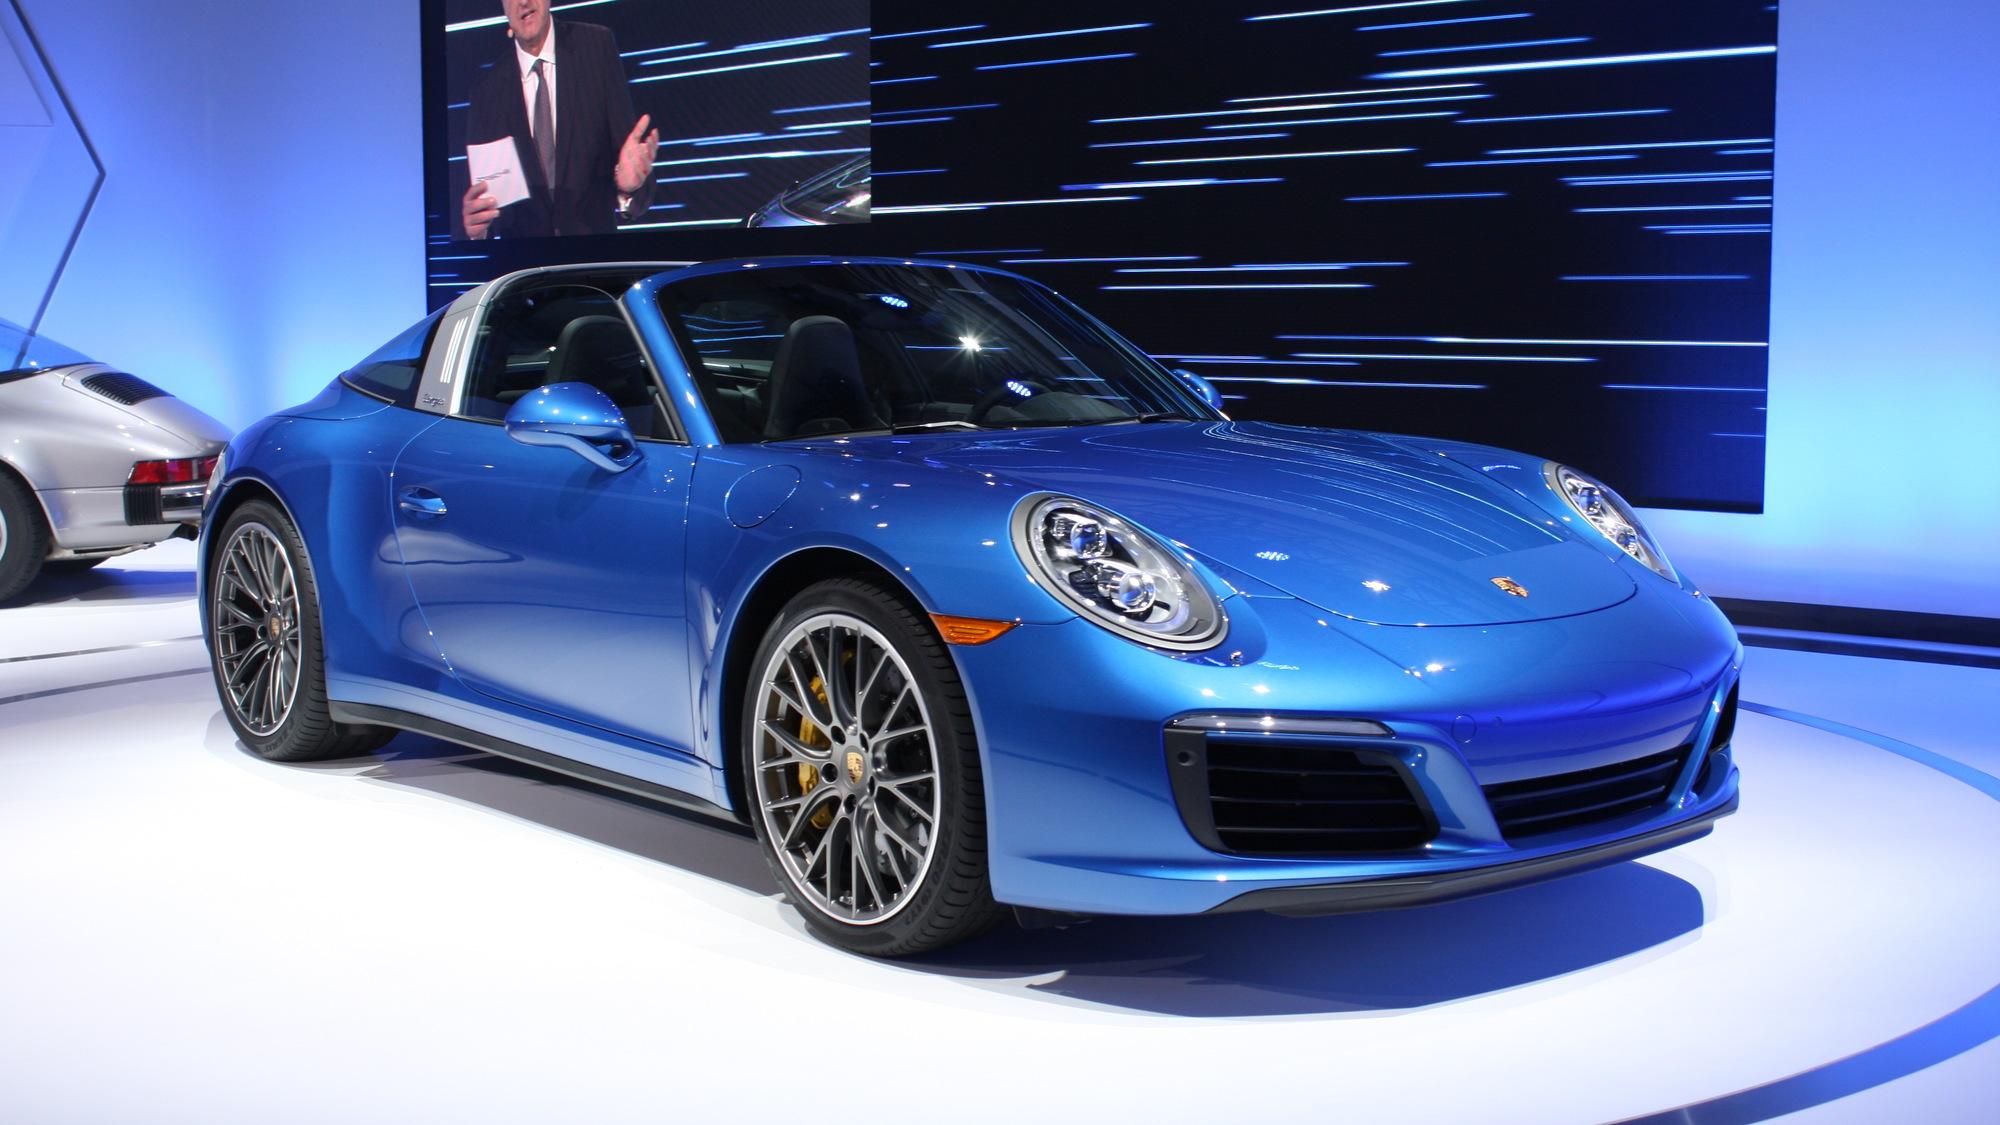 2017 Porsche 911 Targa 4S, 2015 Los Angeles Auto Show